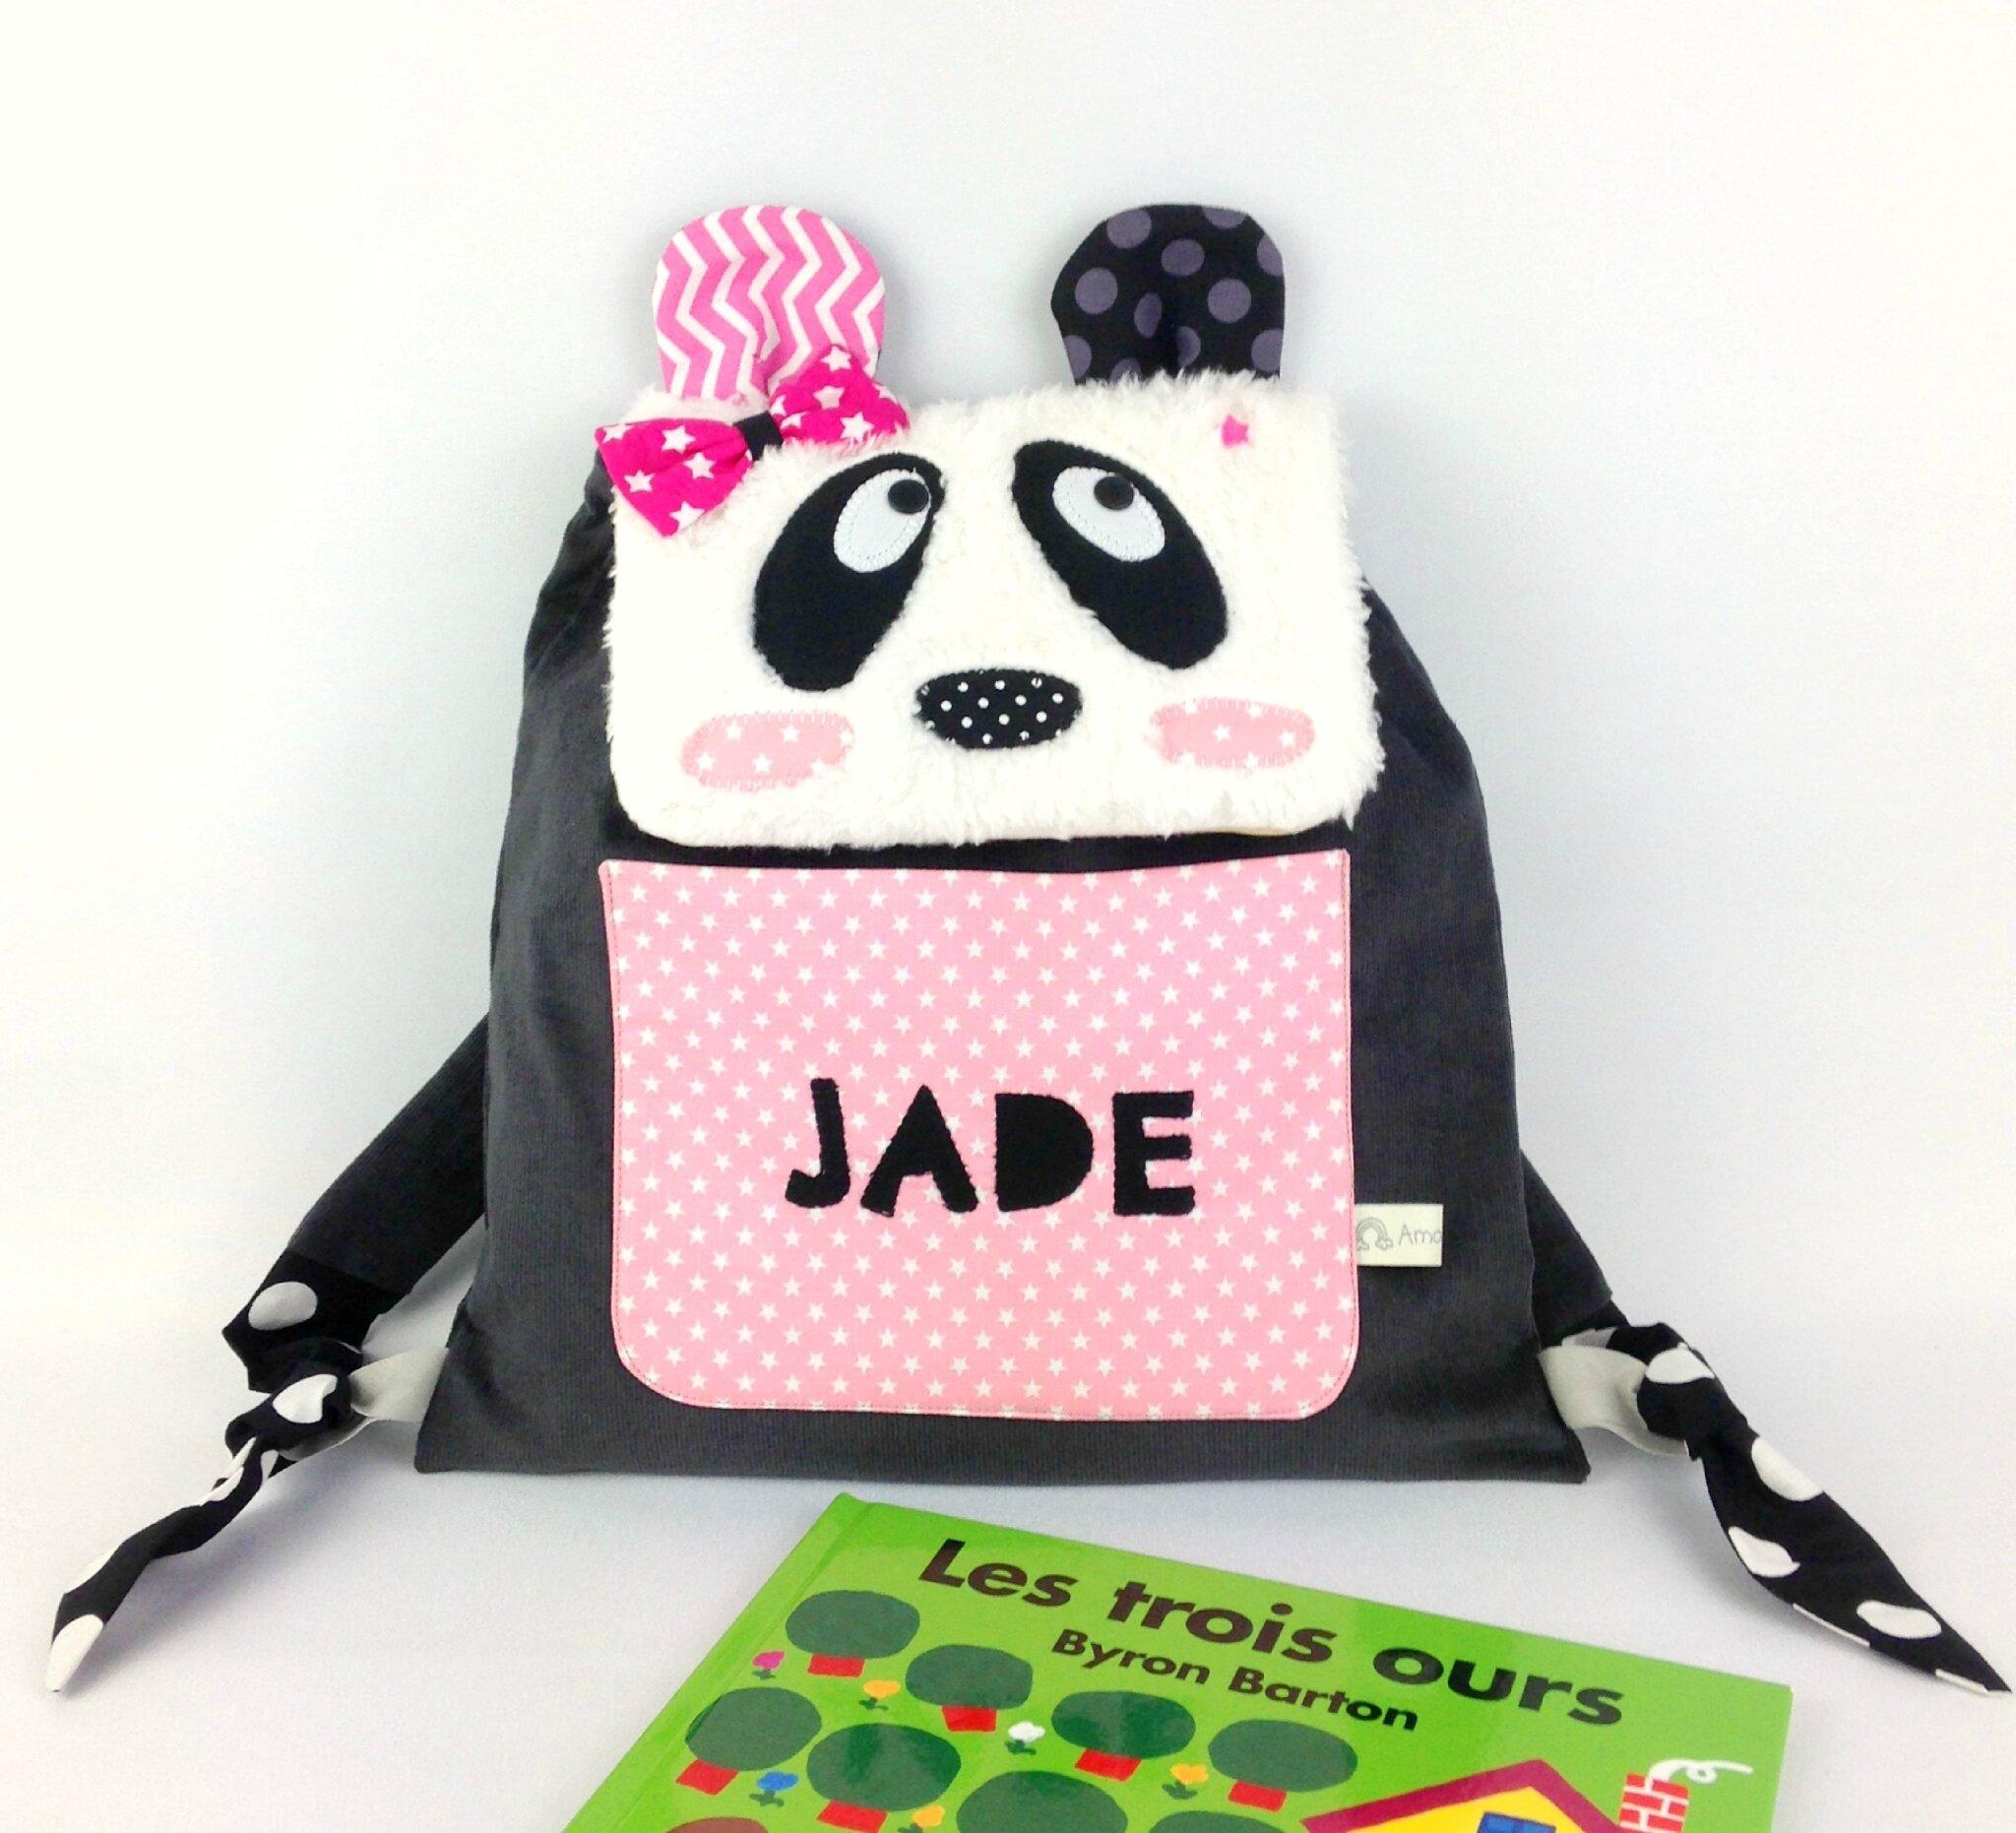 Sac à dos maternelle fille panda rose gris fuchsia personnalisé prénom Jade sac bébé crèche personalized name backpack girl panda grey pink